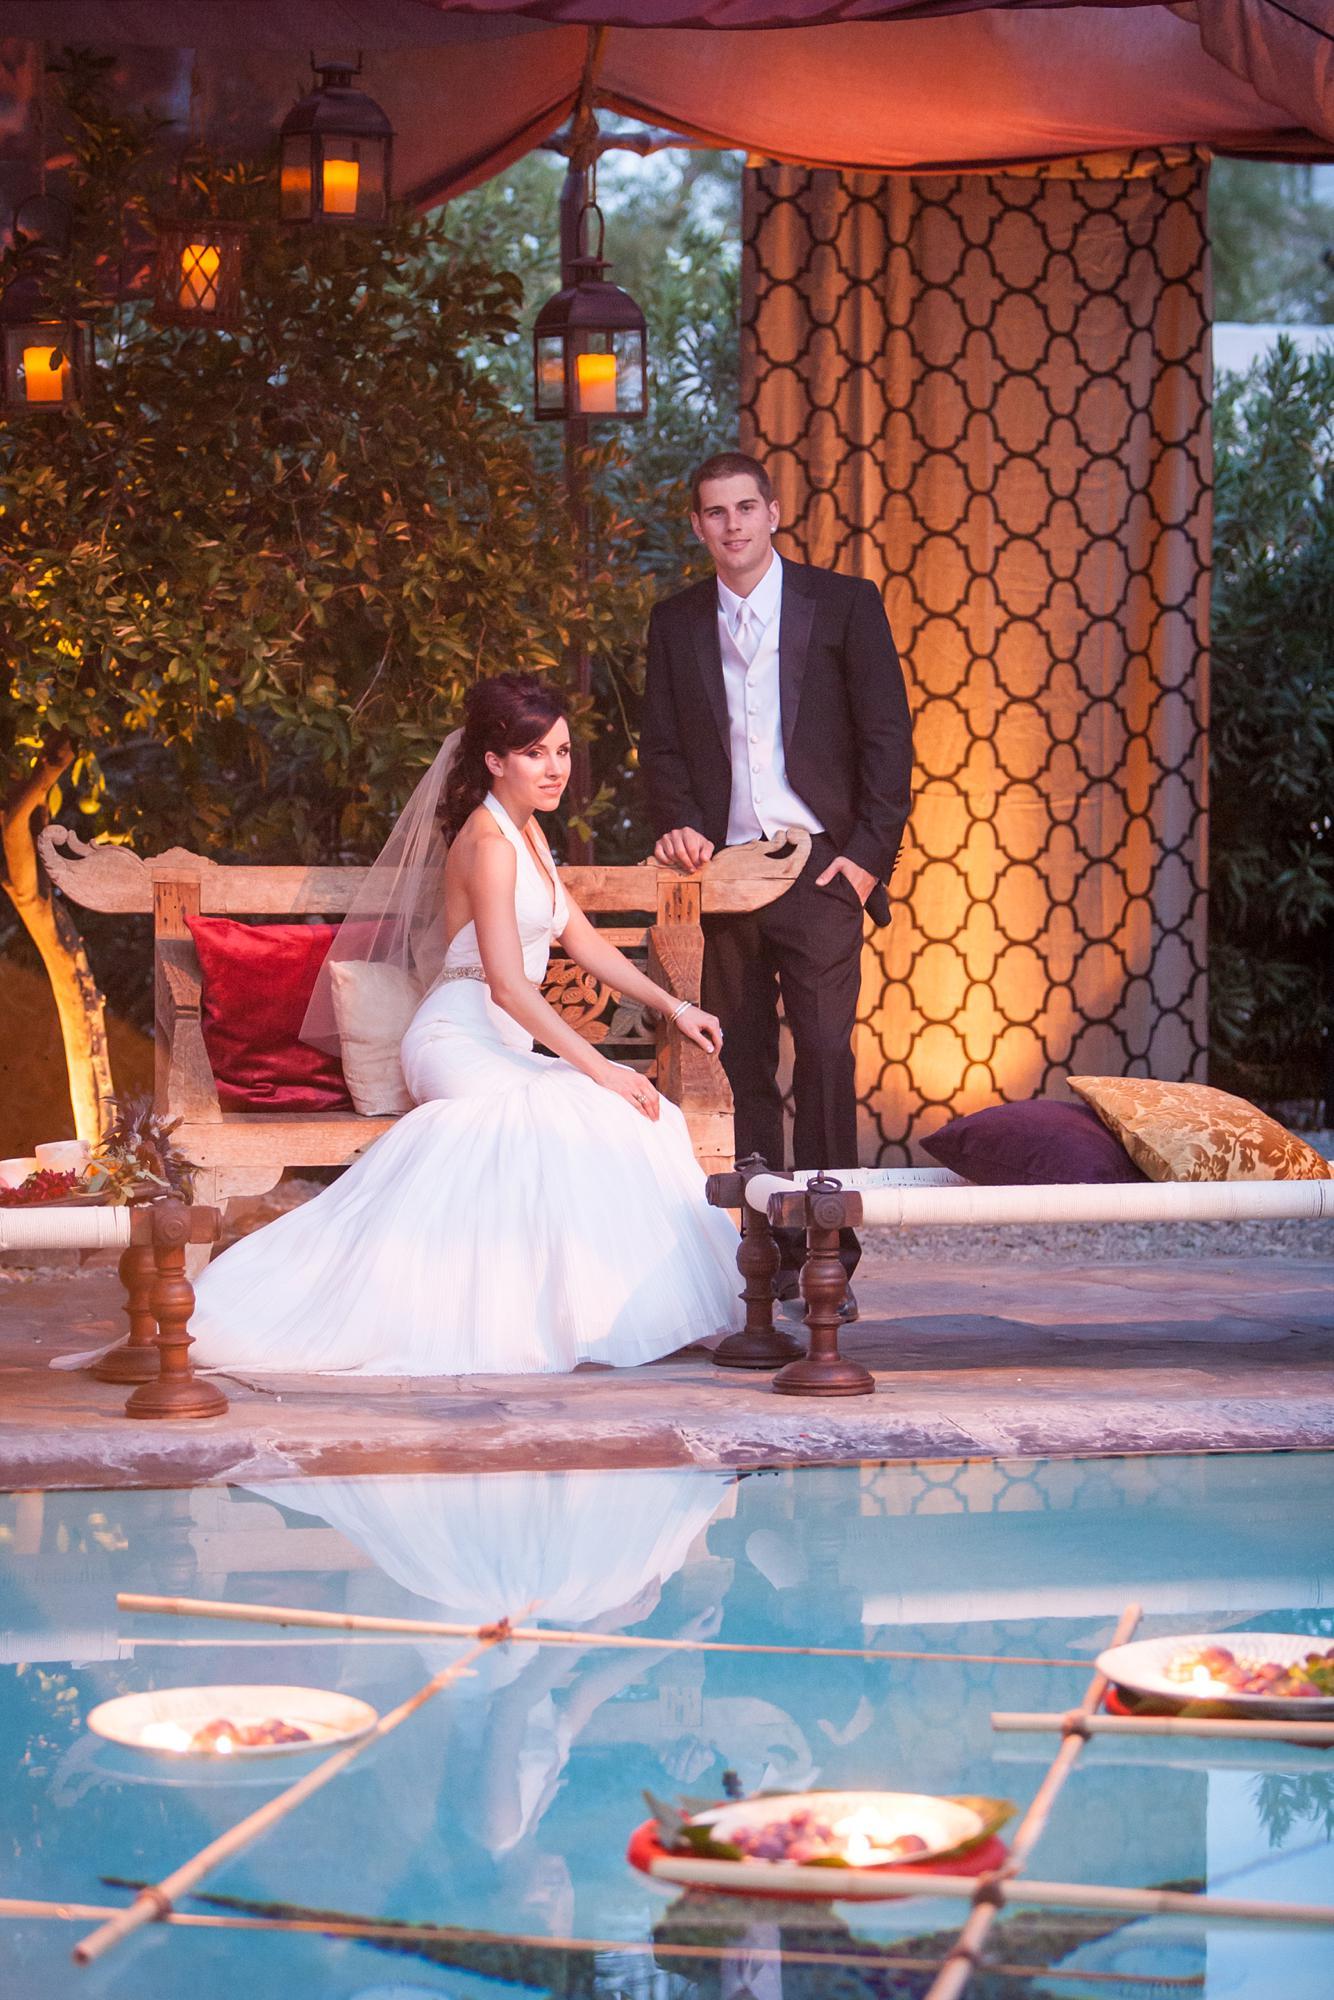 Korakia Wedding | Miki & Sonja Photography | mikiandsonja.com